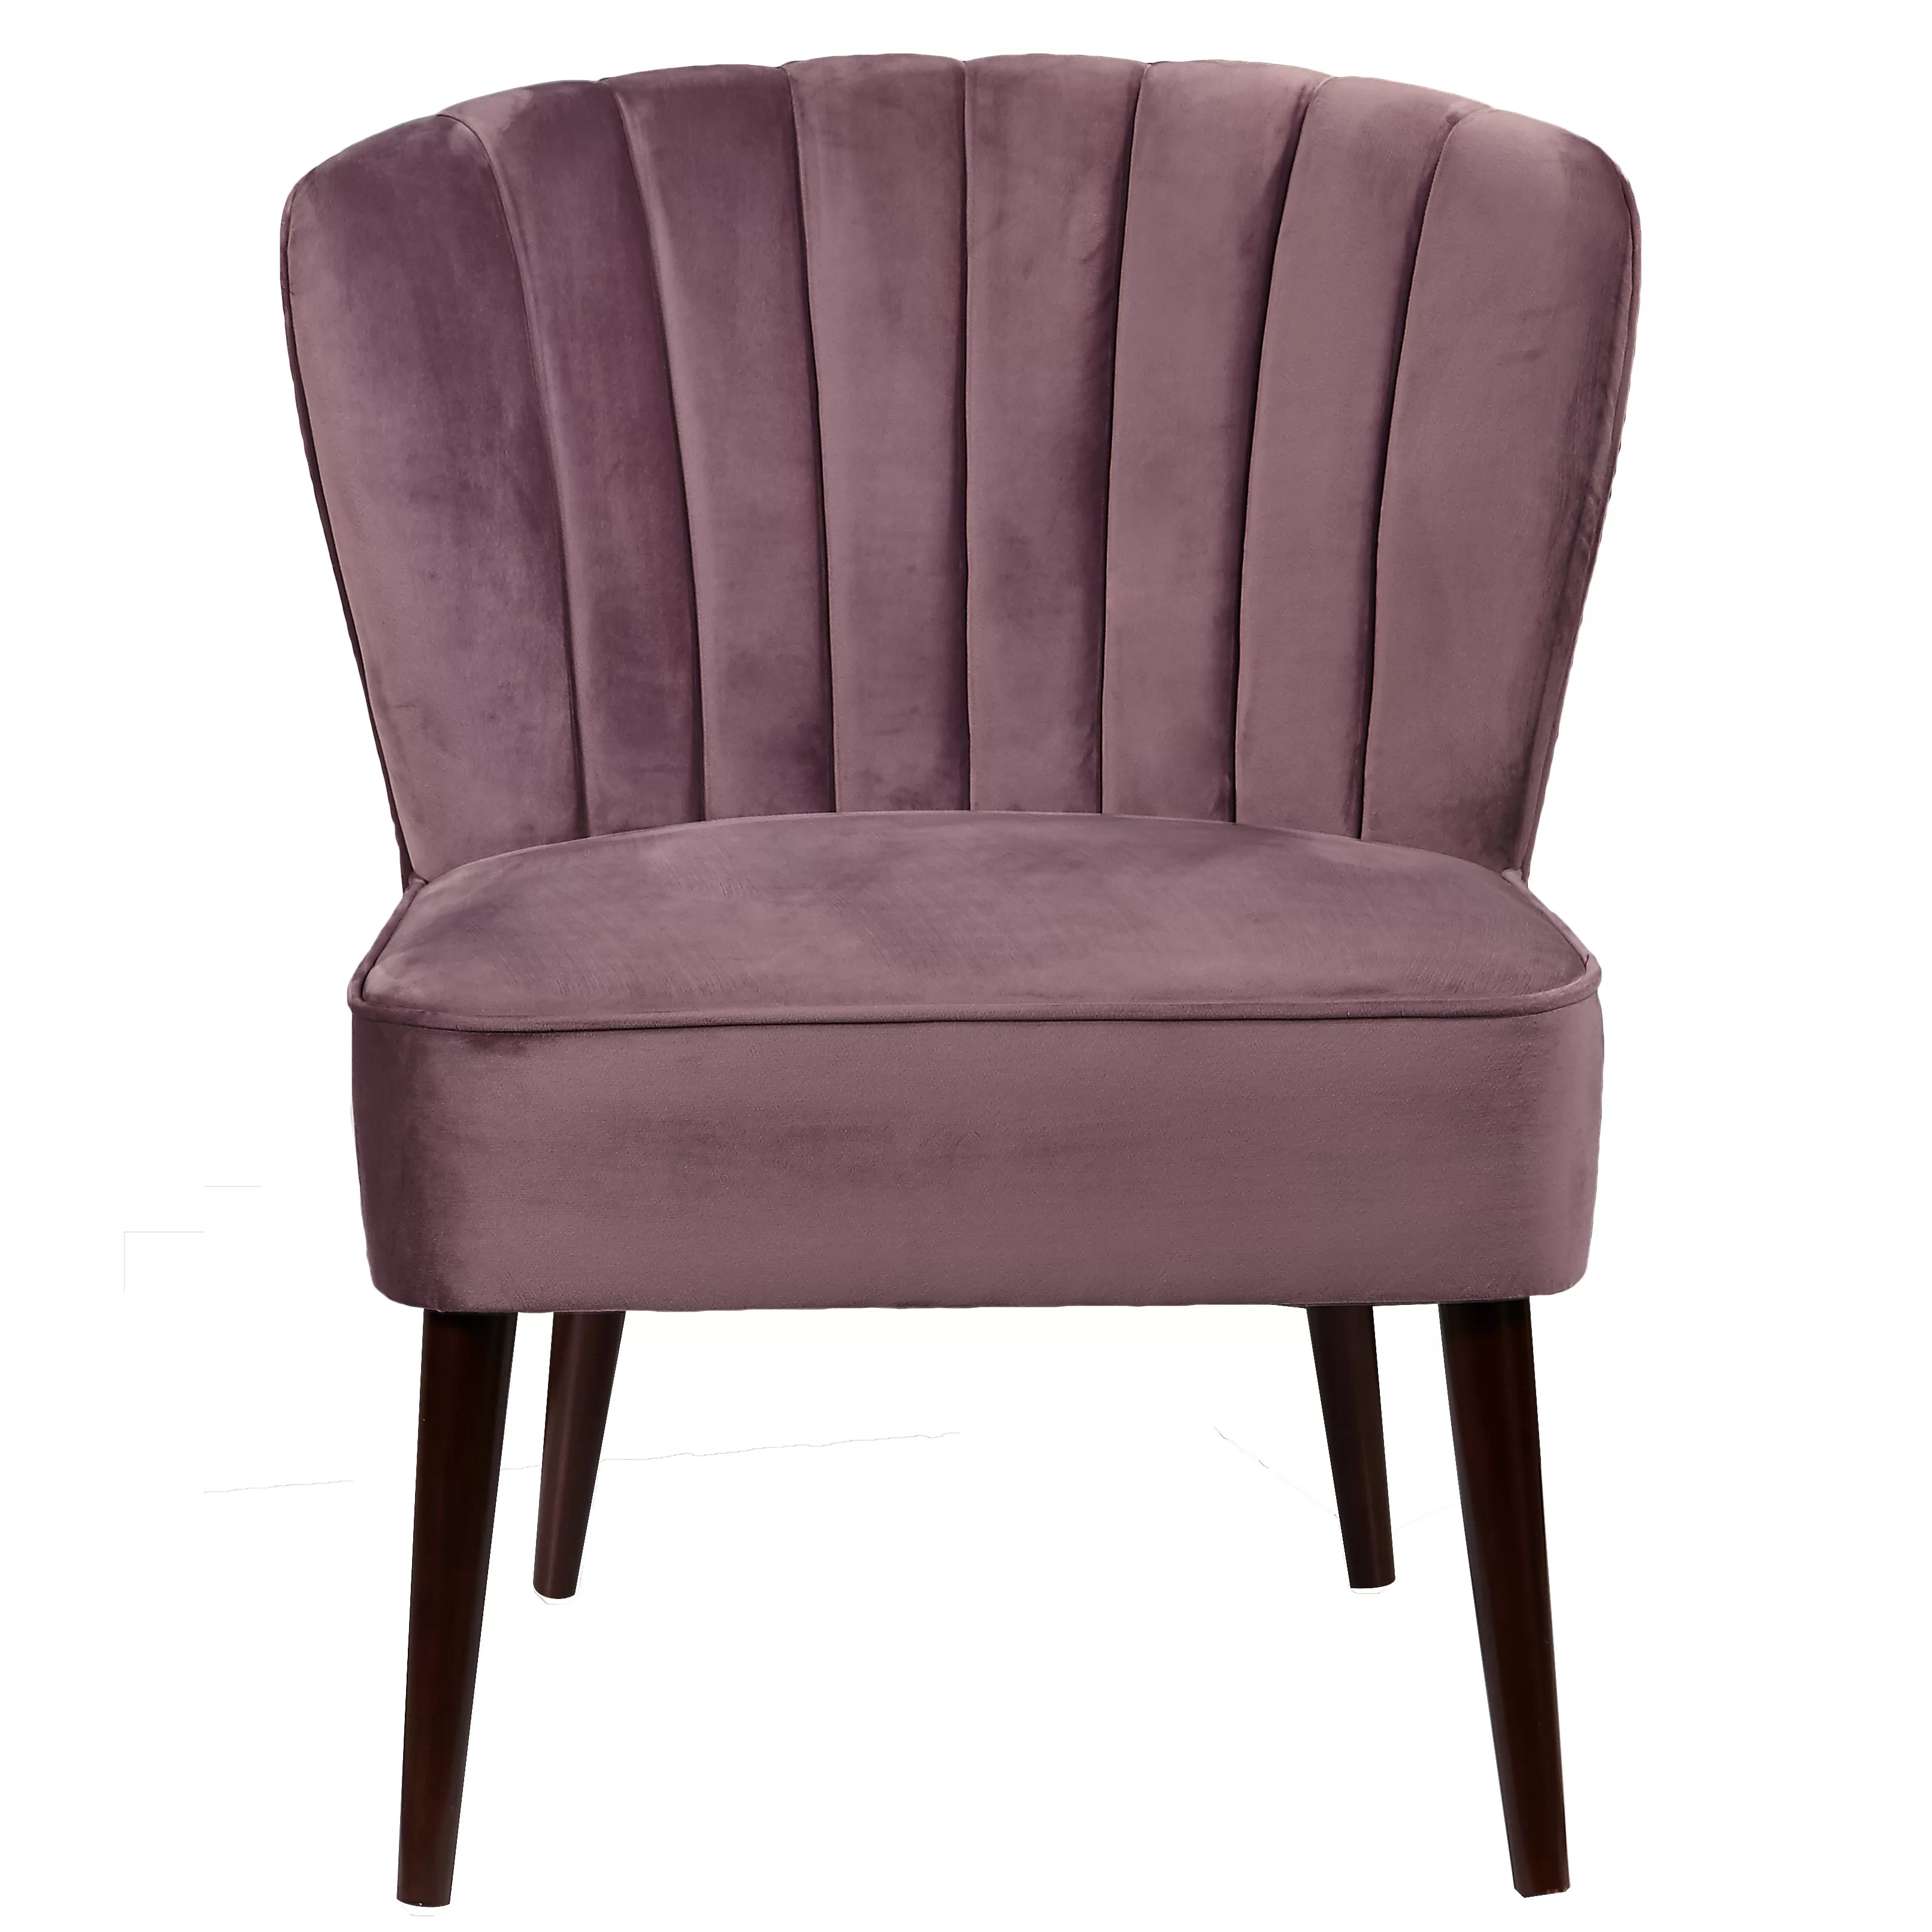 modern slipper chair ergonomic near me alchiba reviews allmodern